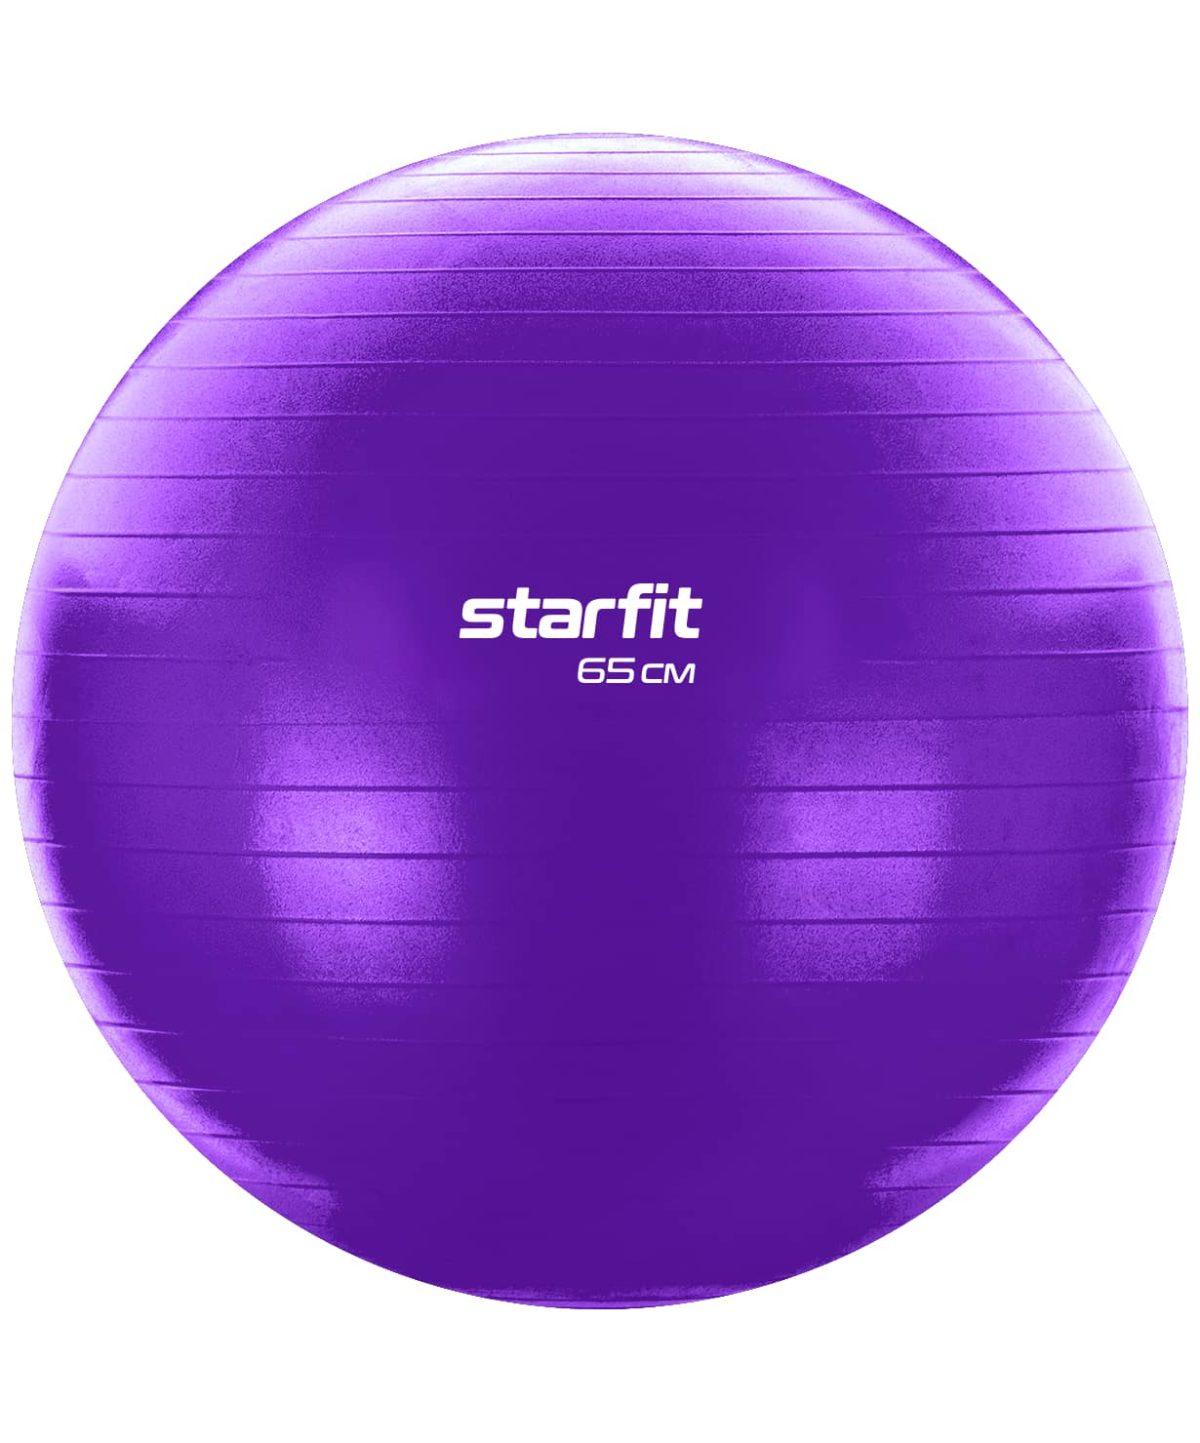 STARFIT Фитбол антивзрыв 65см.1000гр. без насоса GB-104: фиолетовый - 1